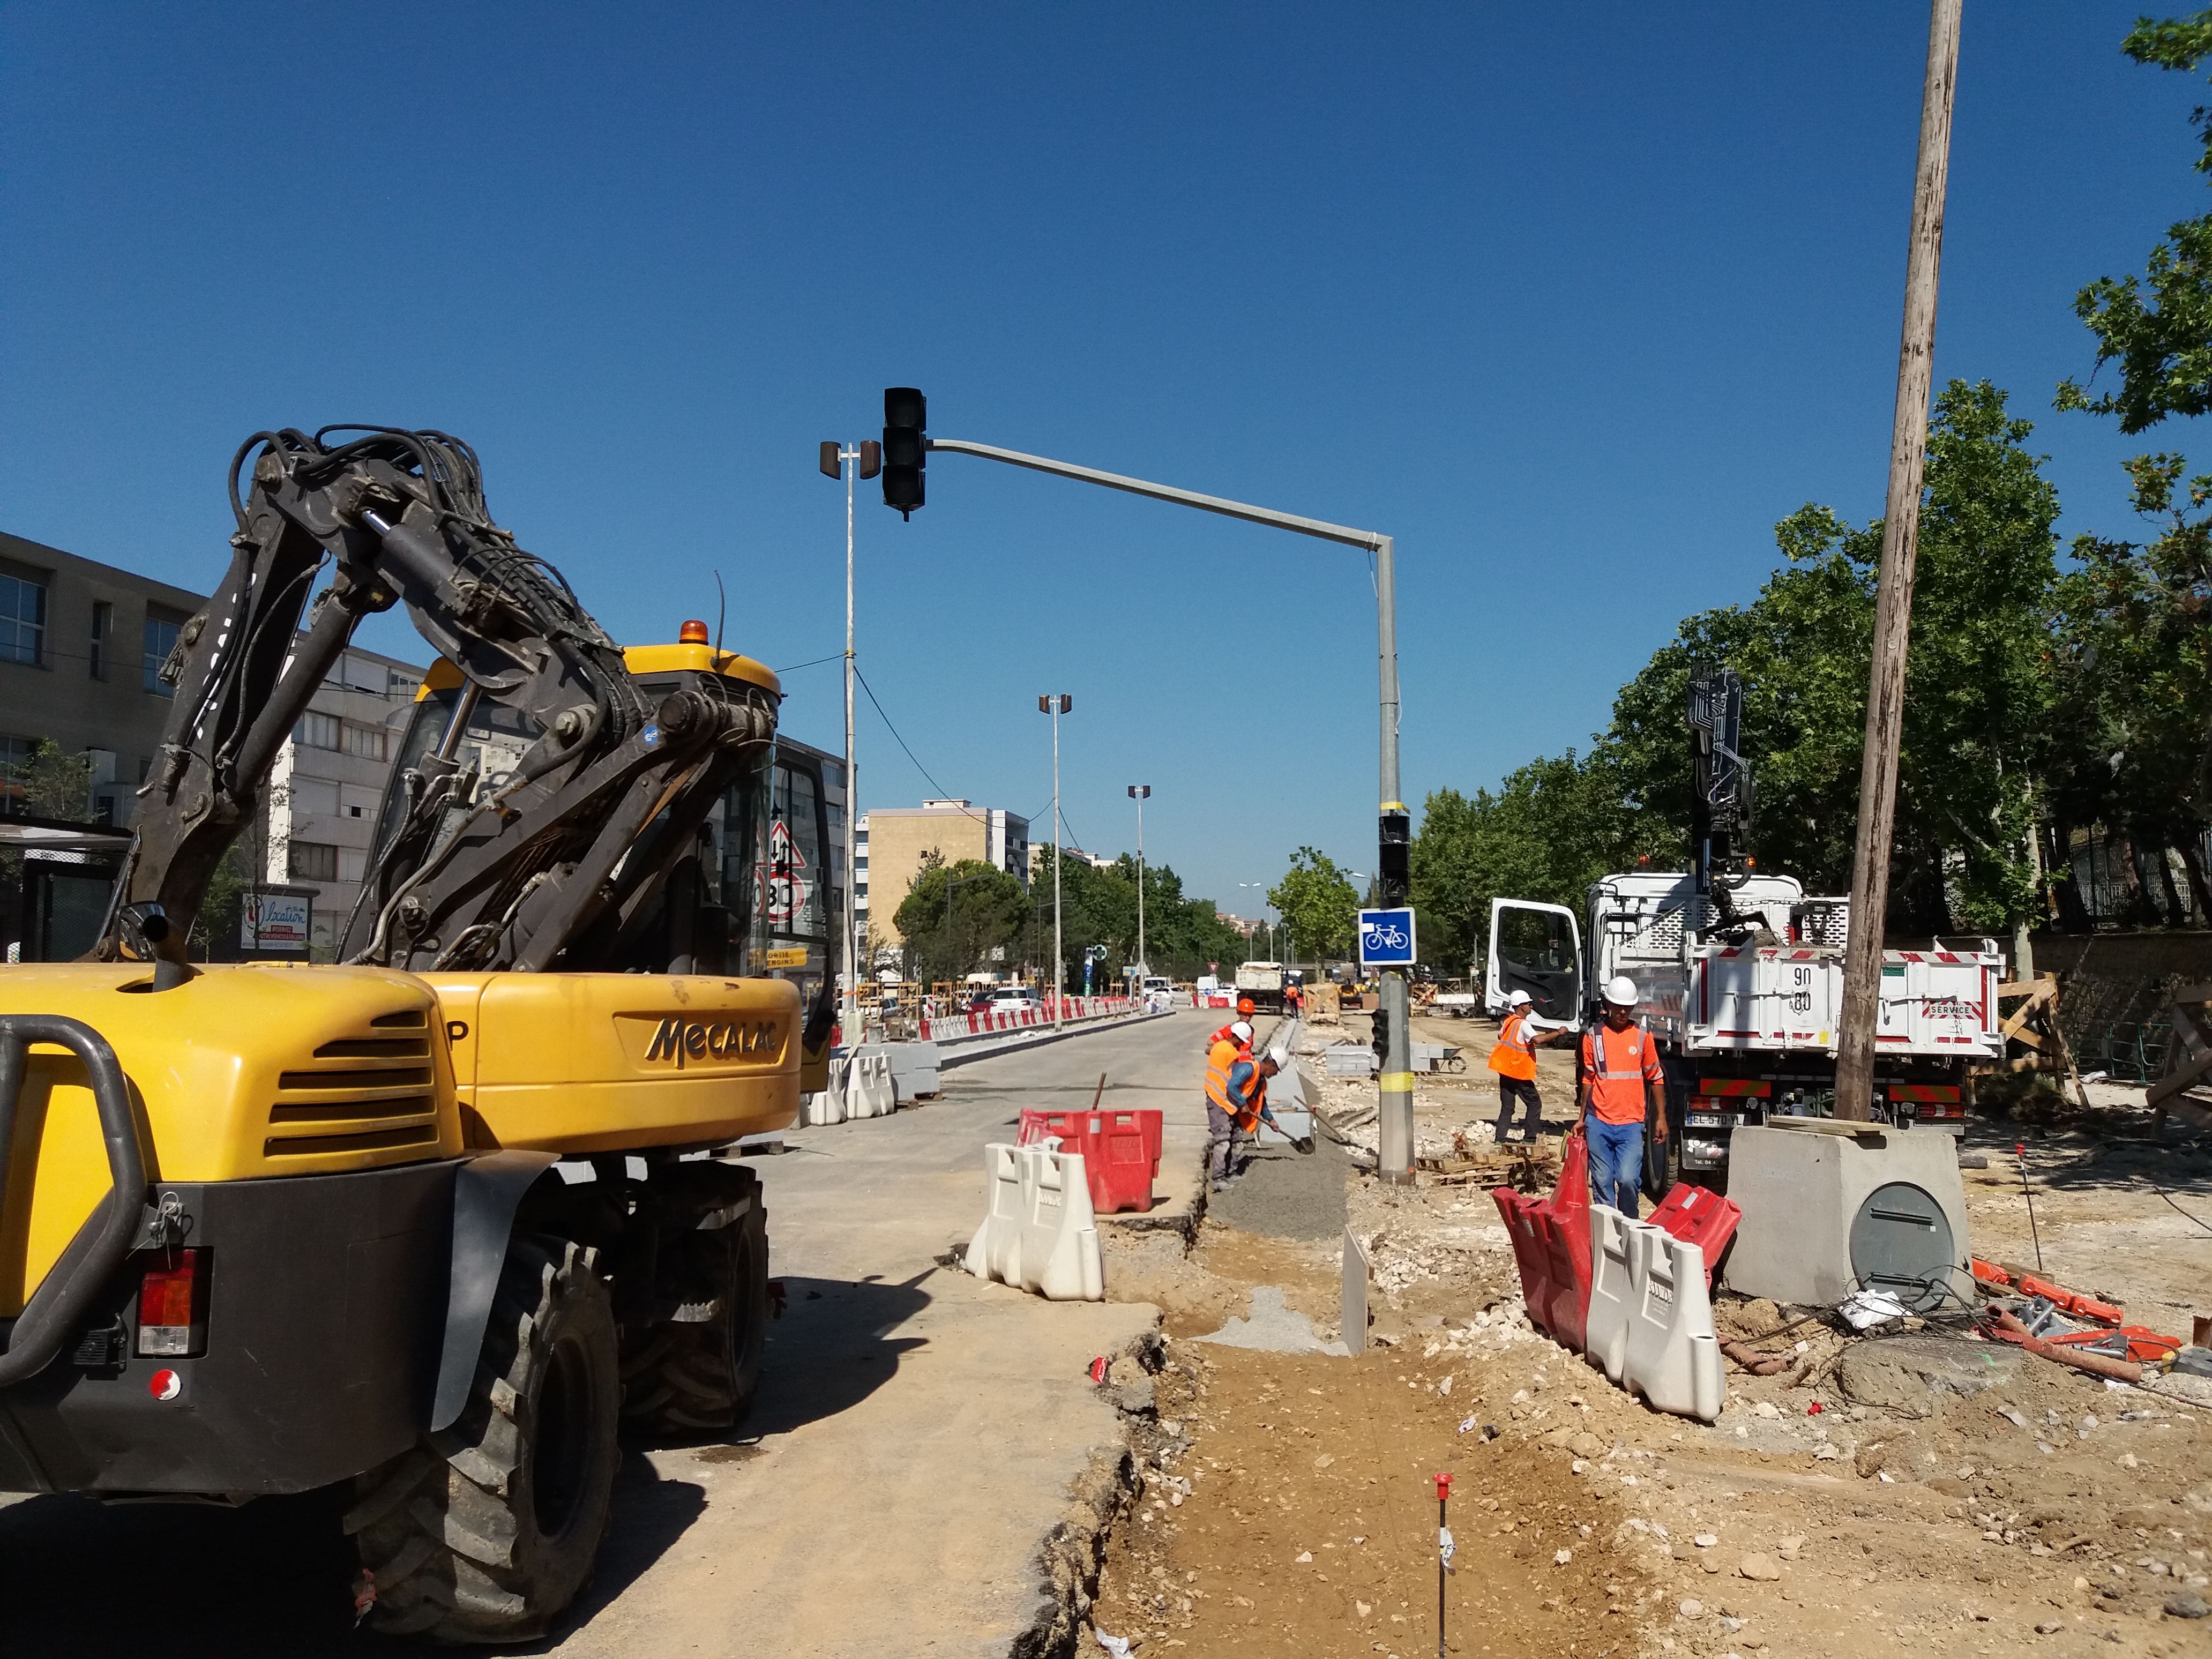 Construction Aix En Provence file:aix-en-provence 20180717 2 - wikimedia commons